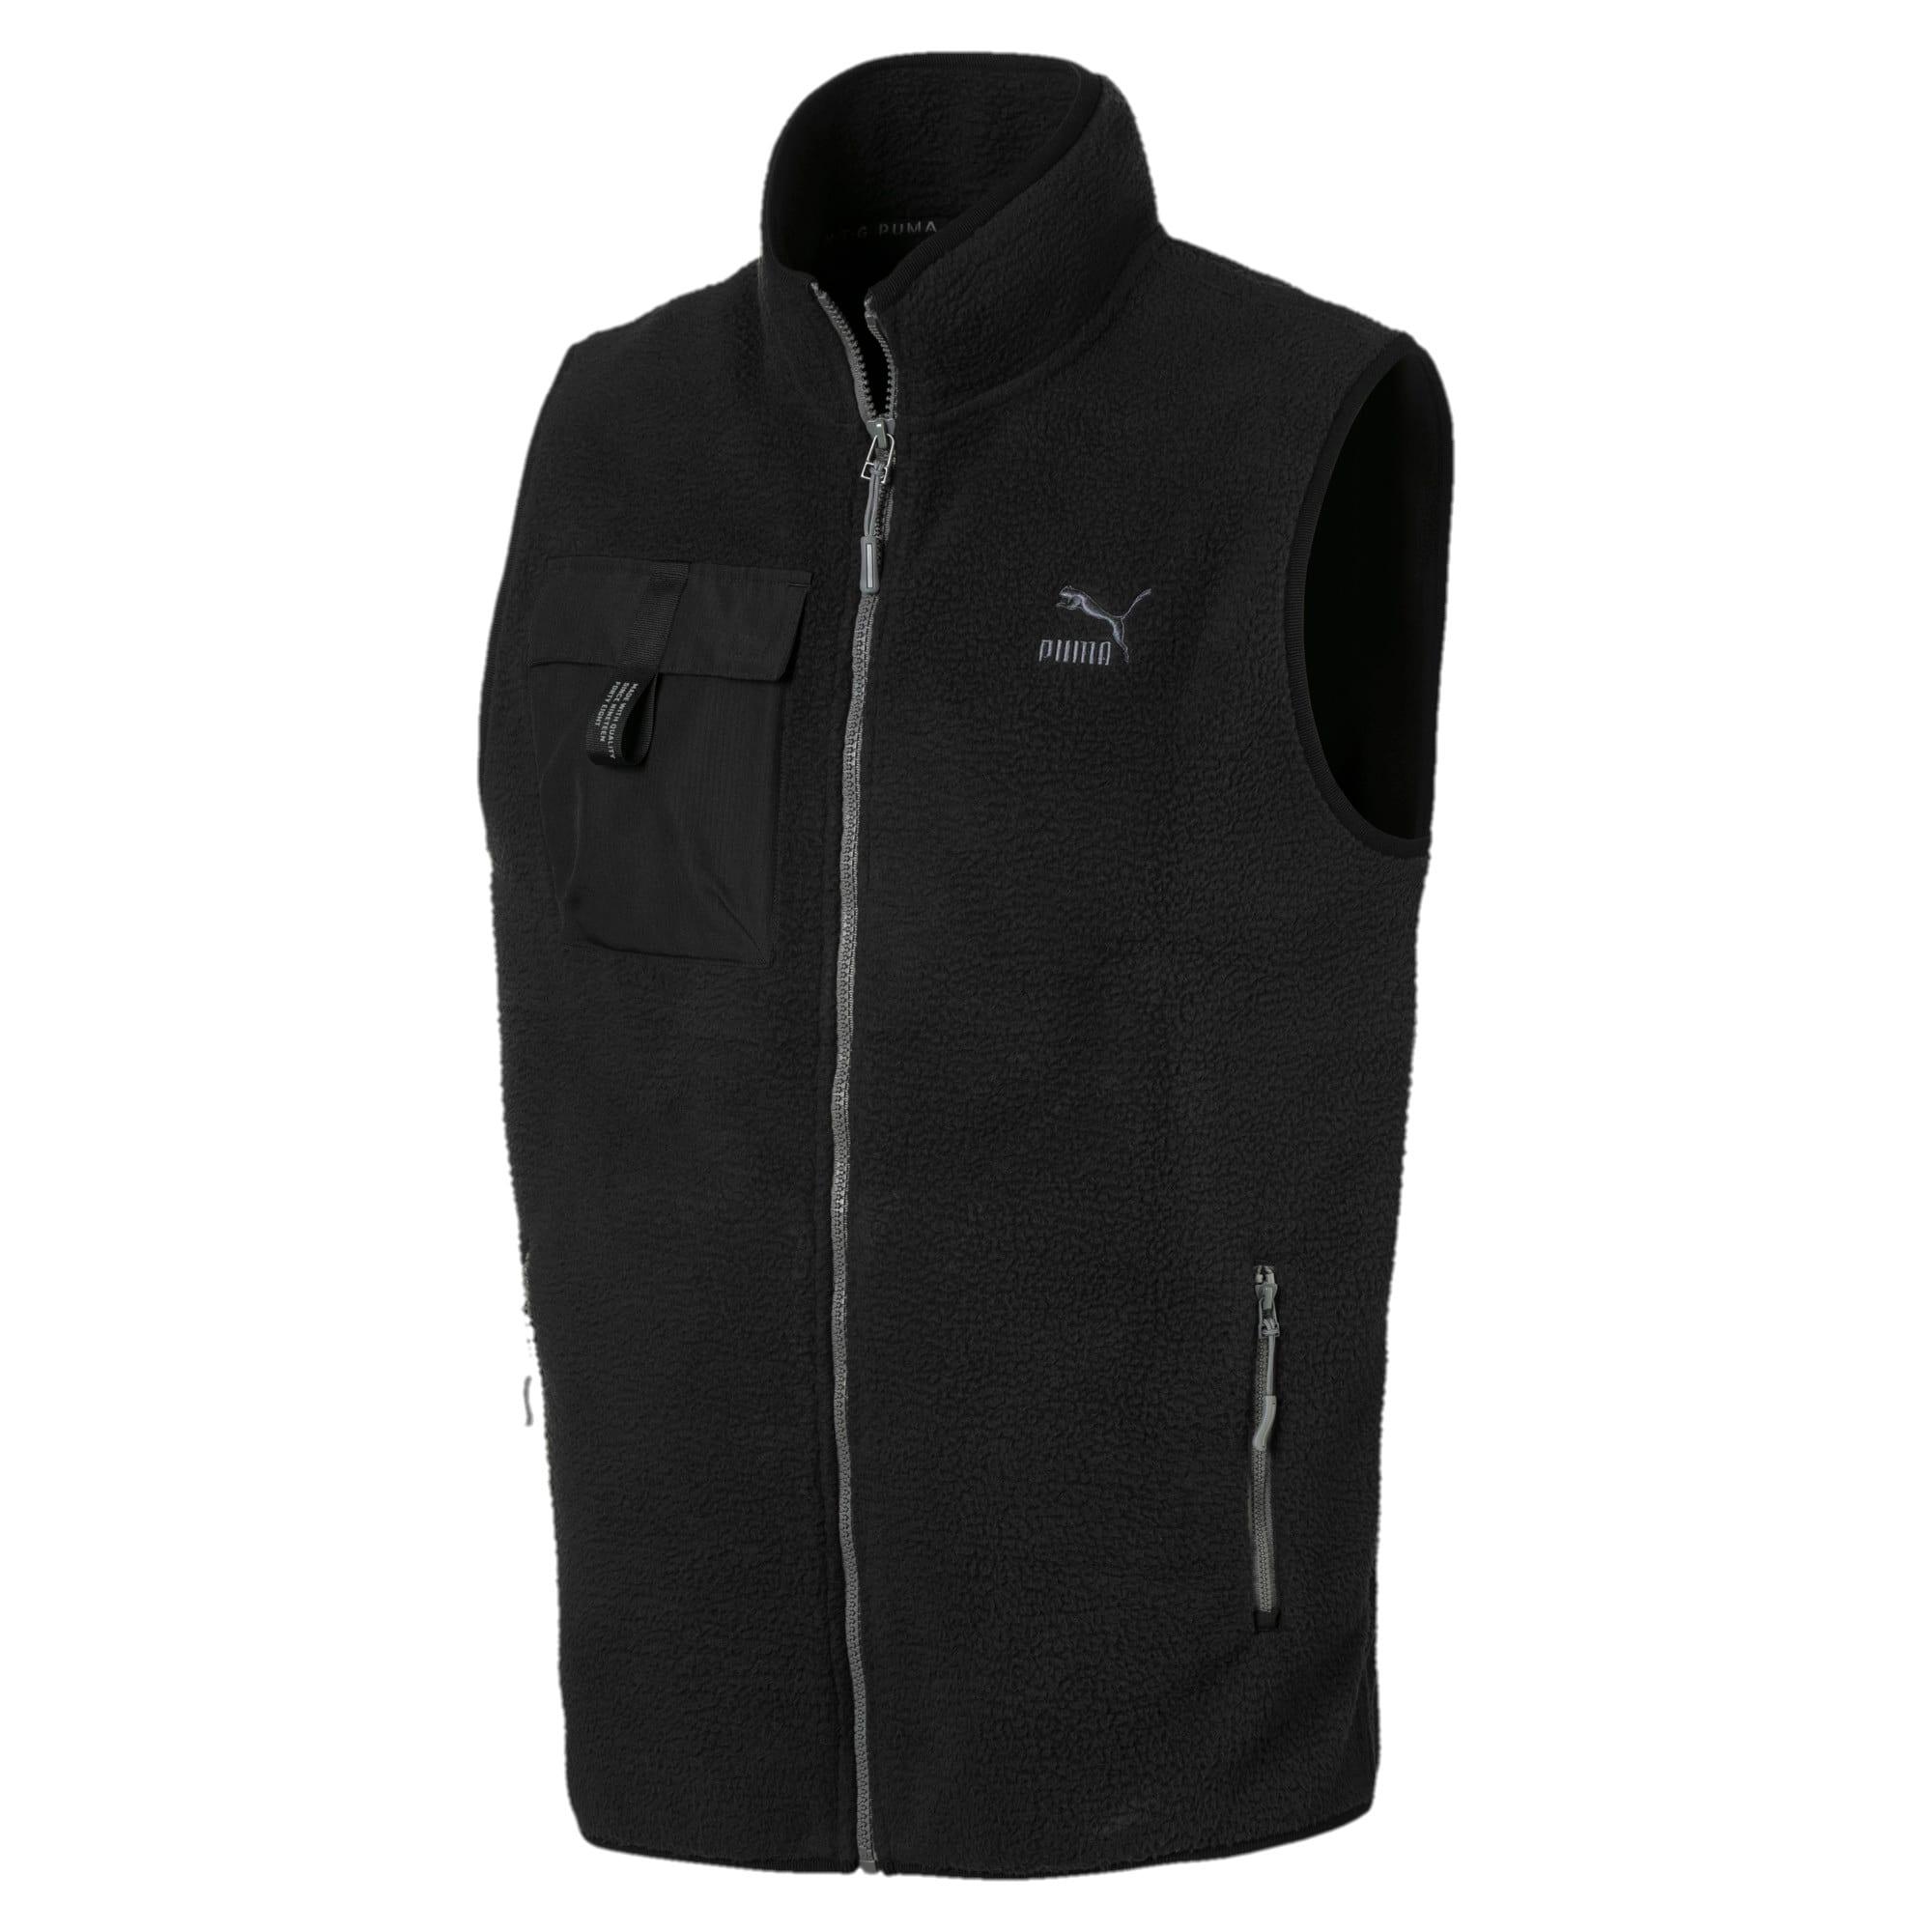 Thumbnail 1 of XTG Trail Fleece Full Zip Men's Pocket Gilet, Puma Black, medium